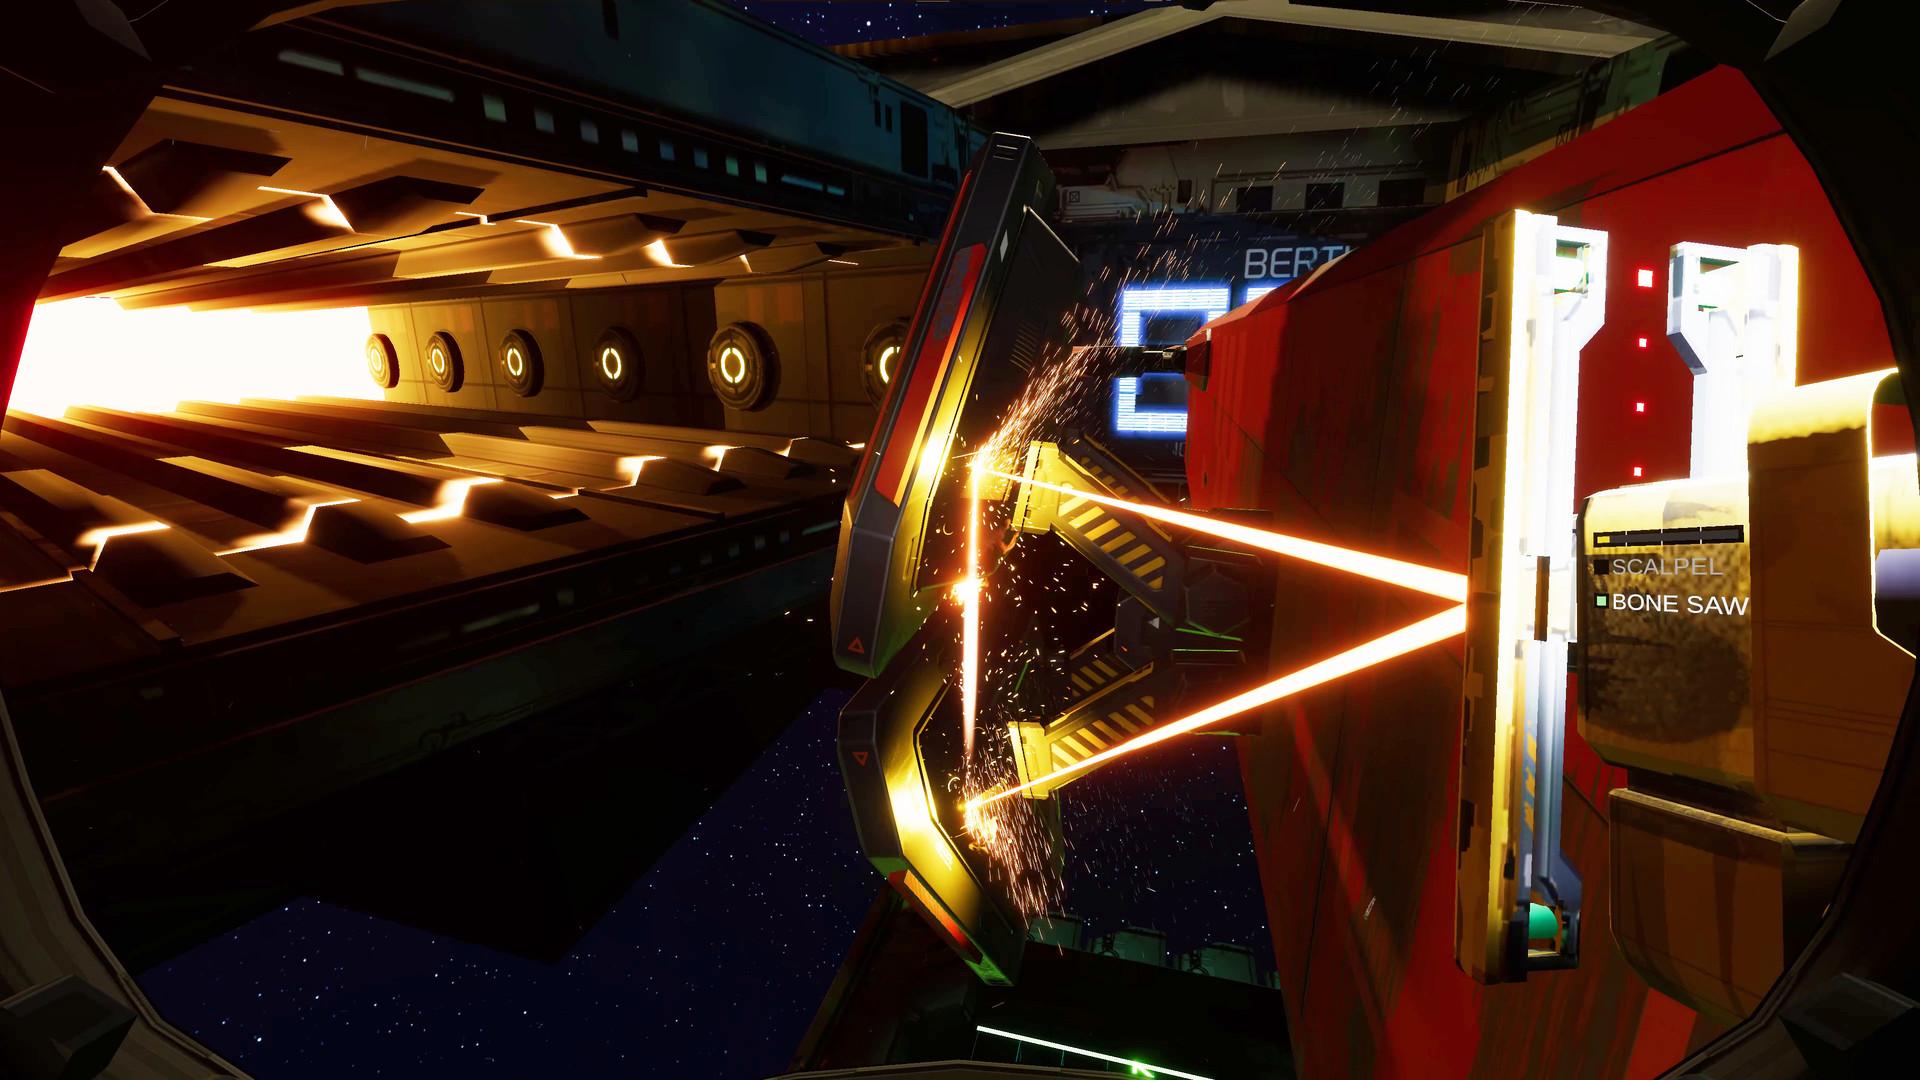 迷走深空:碎舰师/Hardspace: Shipbreaker插图11